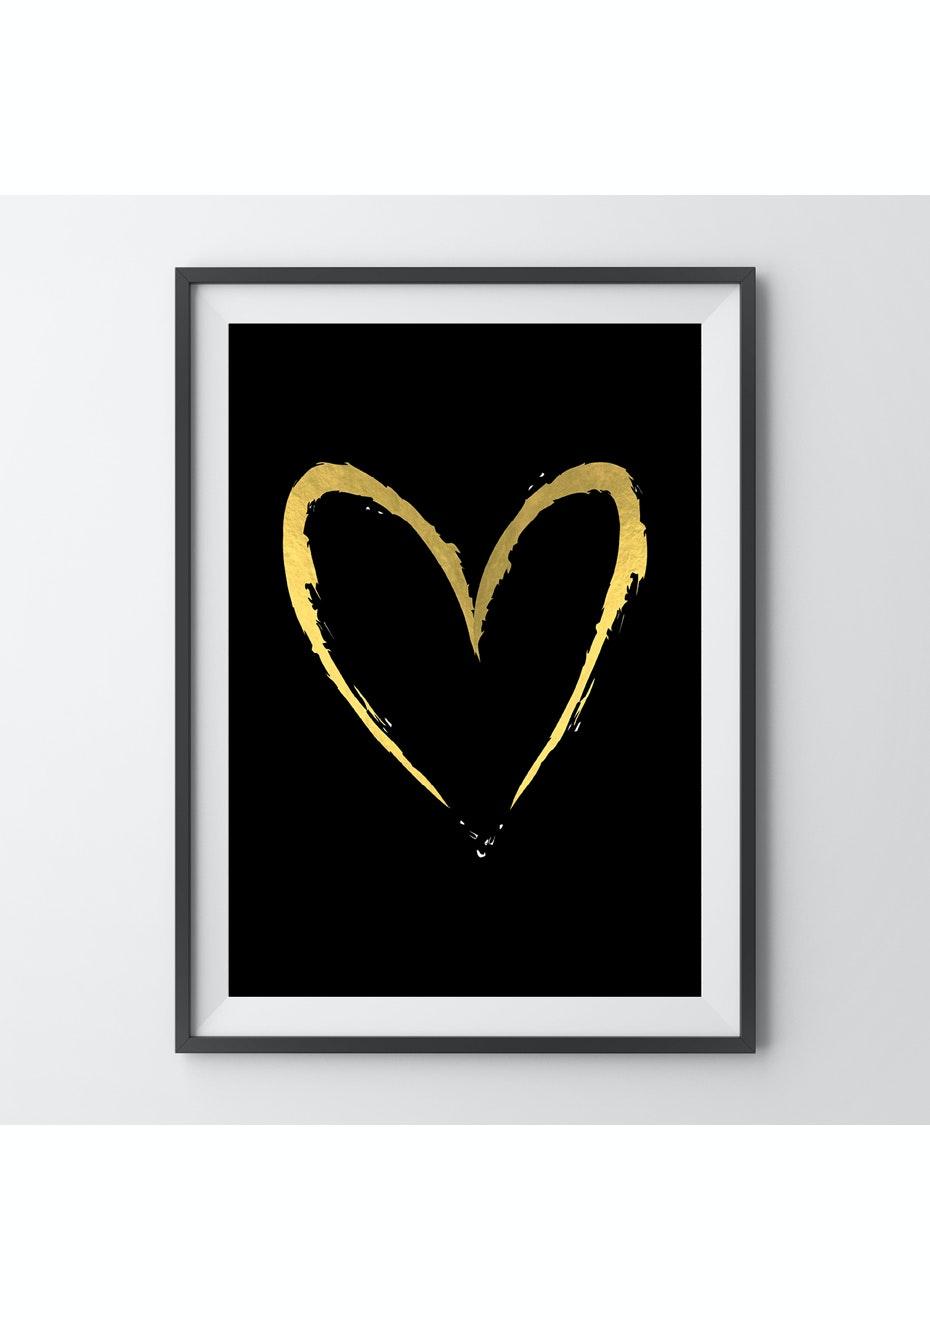 Simply Creative - Gold Heart - A4 Gold Foil Print